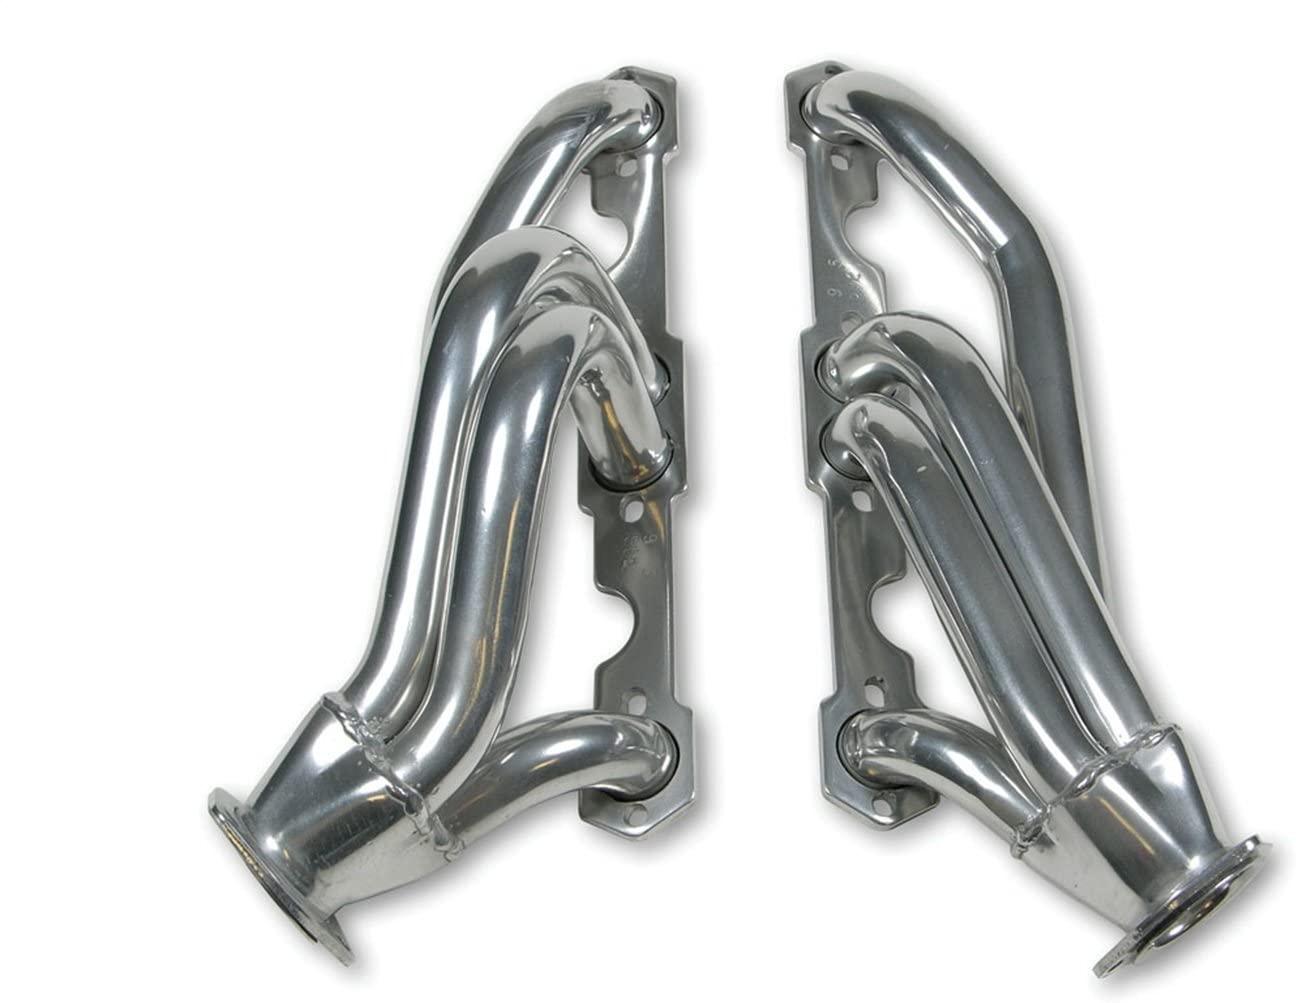 Flowtech Shorty Headers Chevy/Gmc S10/15 265-400 Swap